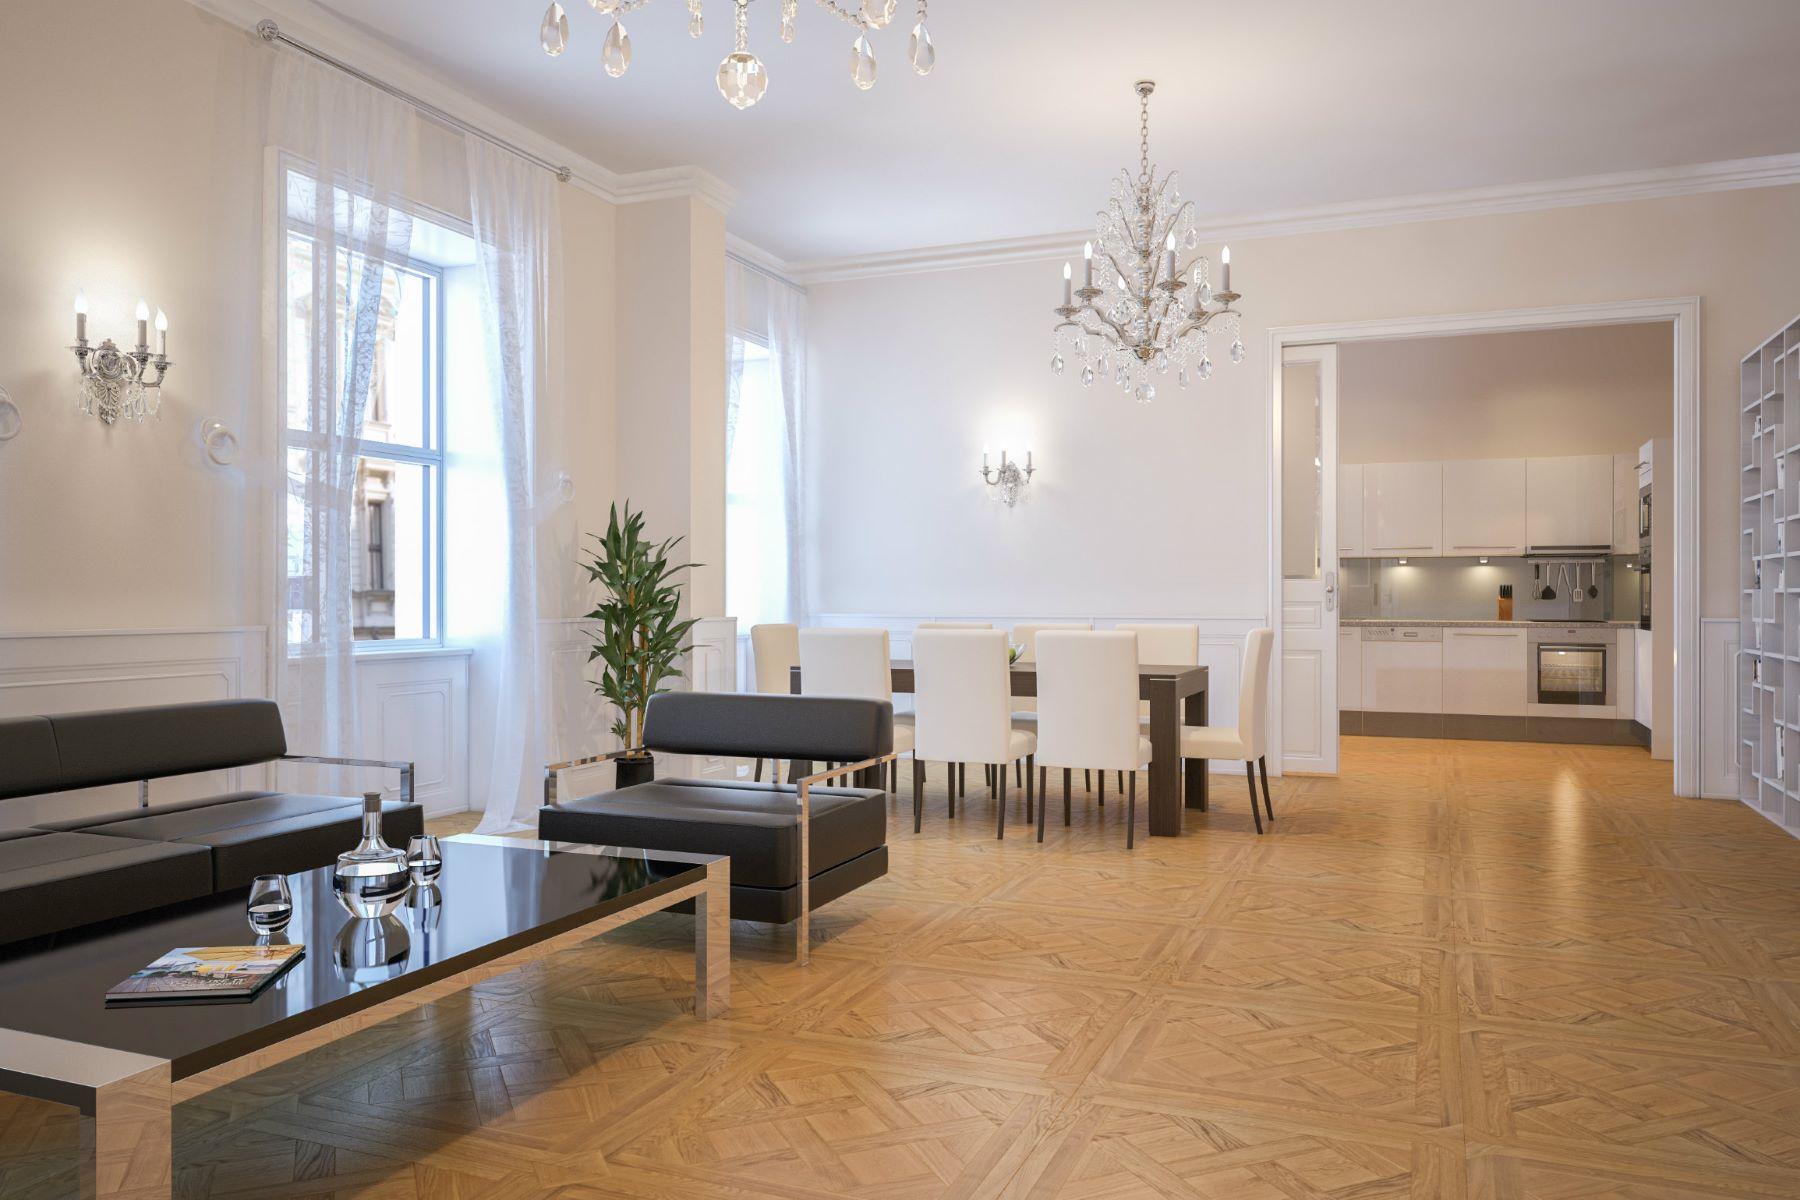 Appartamento per Vendita alle ore LUXURIOUS 2 BED APARTMENT Vienna, Città In Austria, 1010 Austria